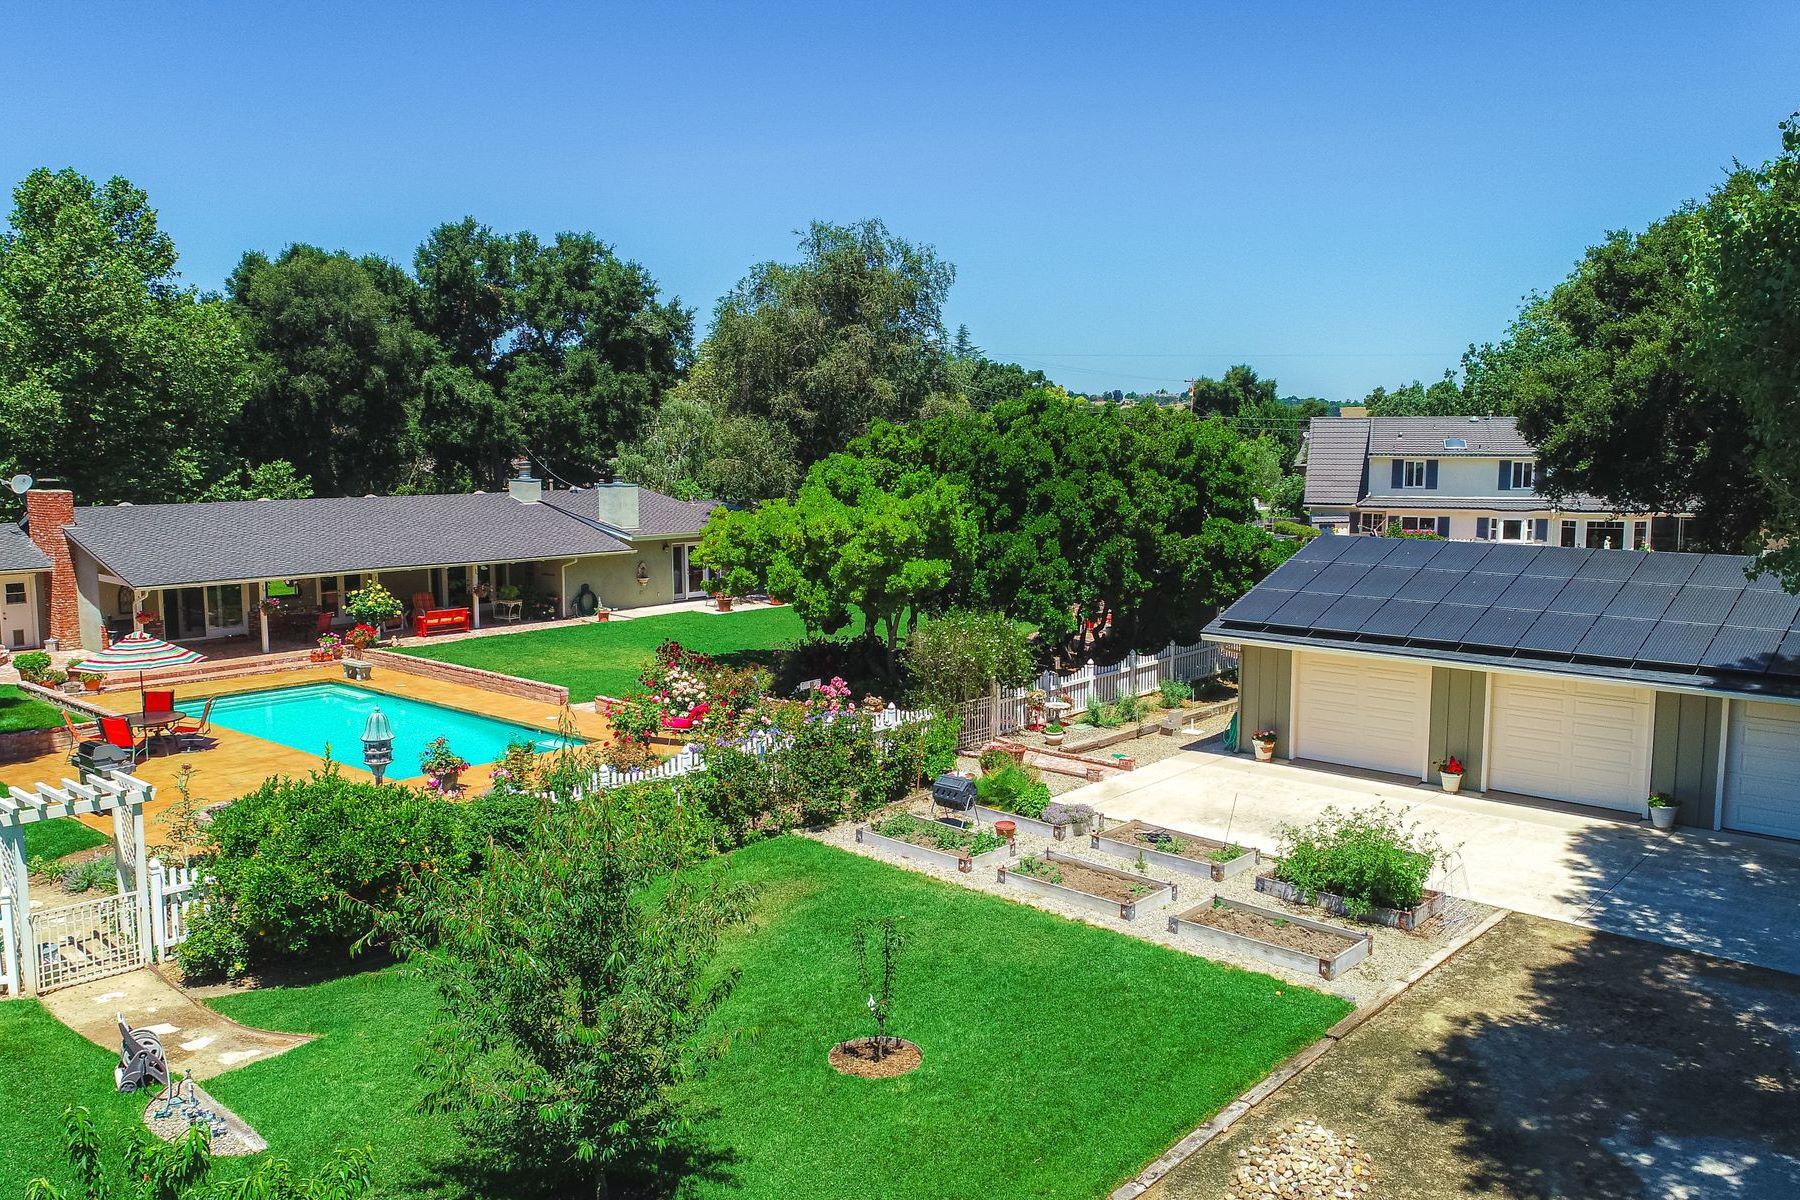 Single Family Homes for Sale at Sunrise Secret Garden 2305 Sunrise Way Solvang, California 93463 United States